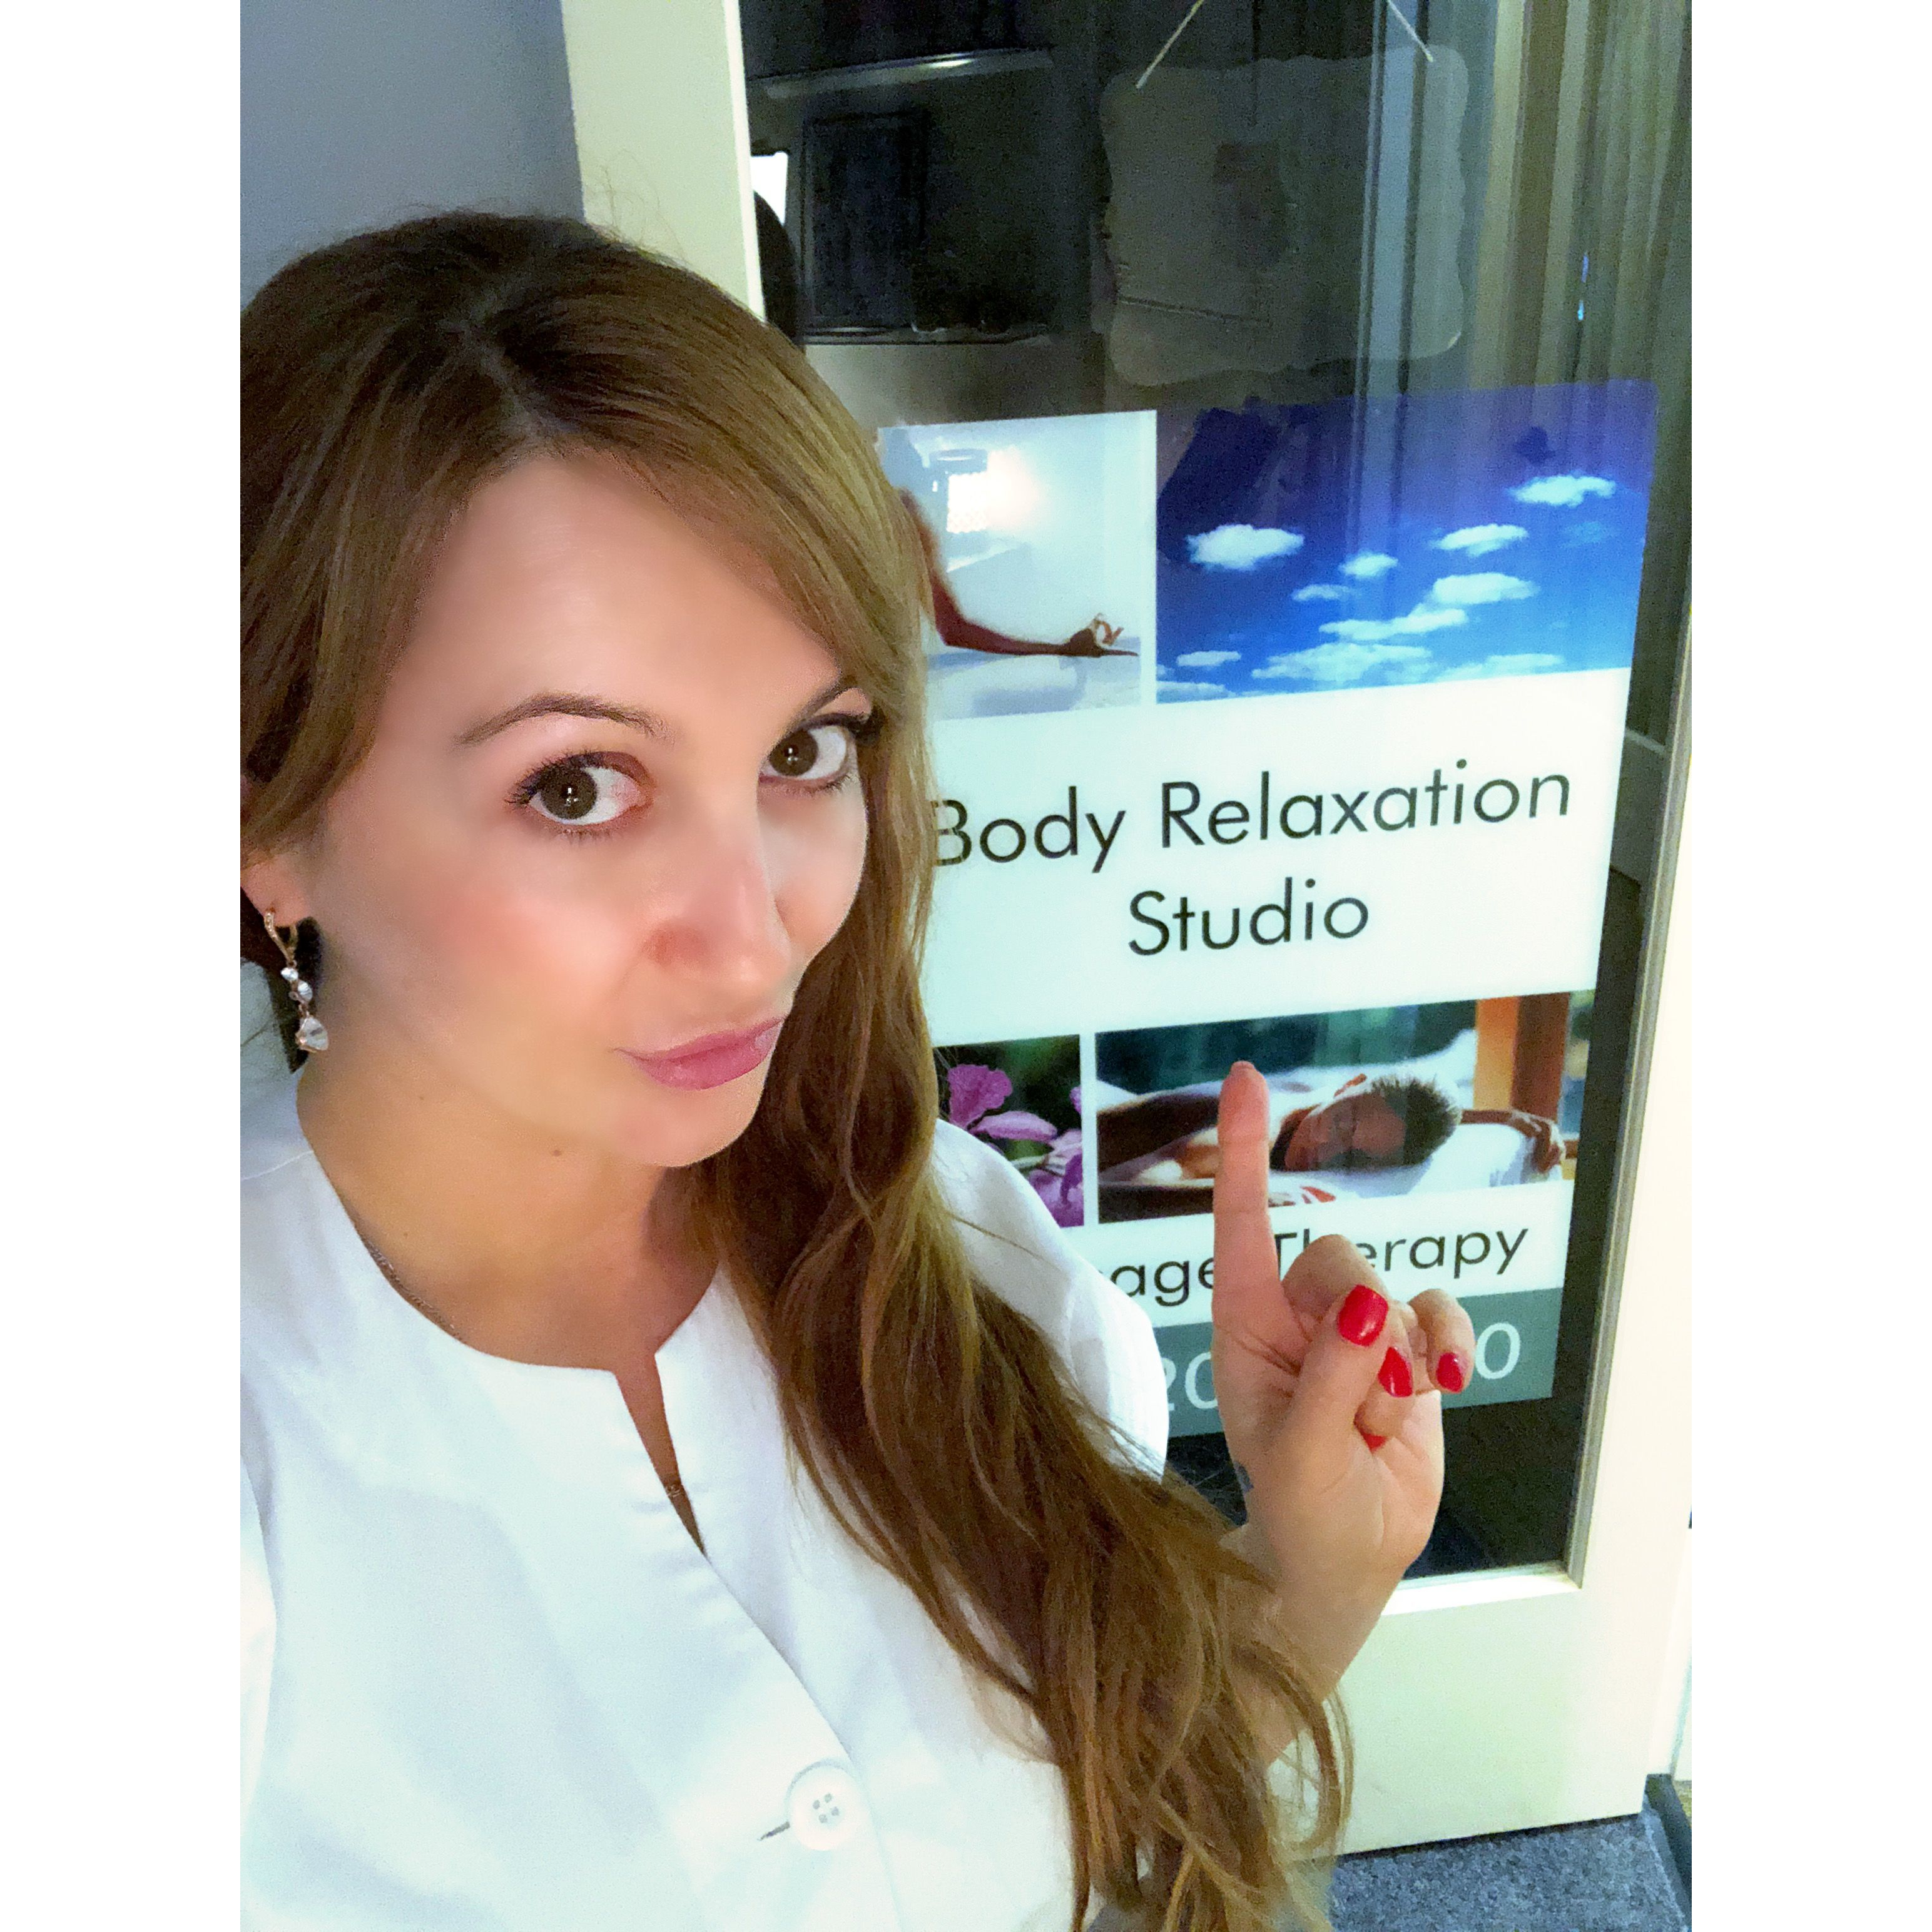 Body Relaxation Studio